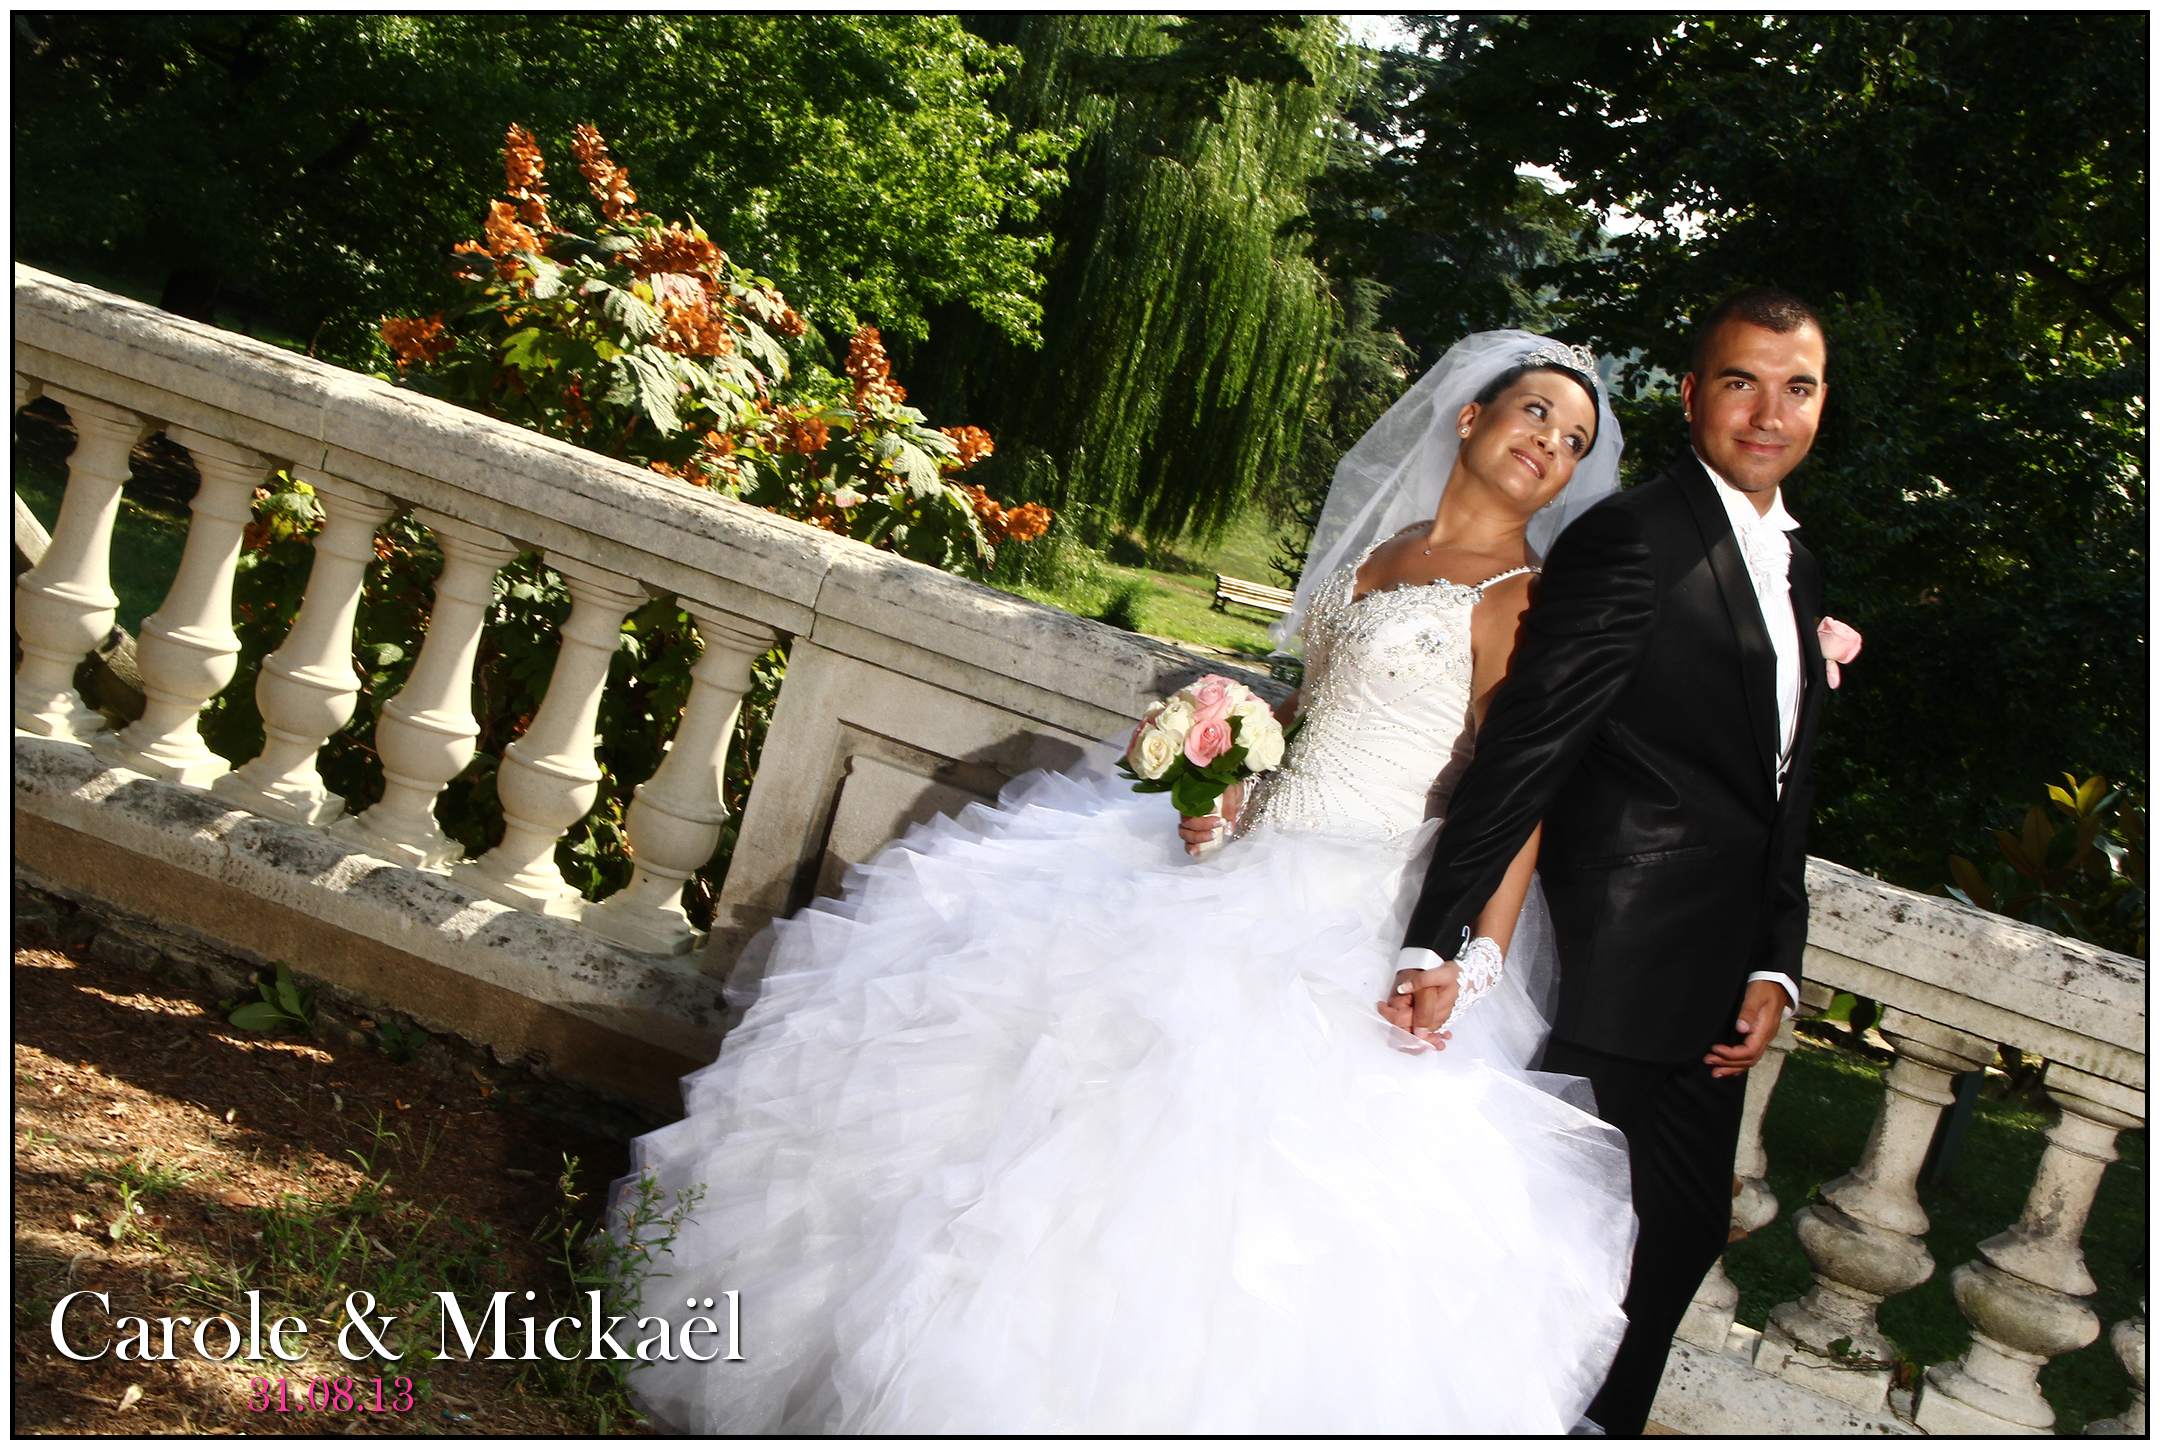 Mariage Carole